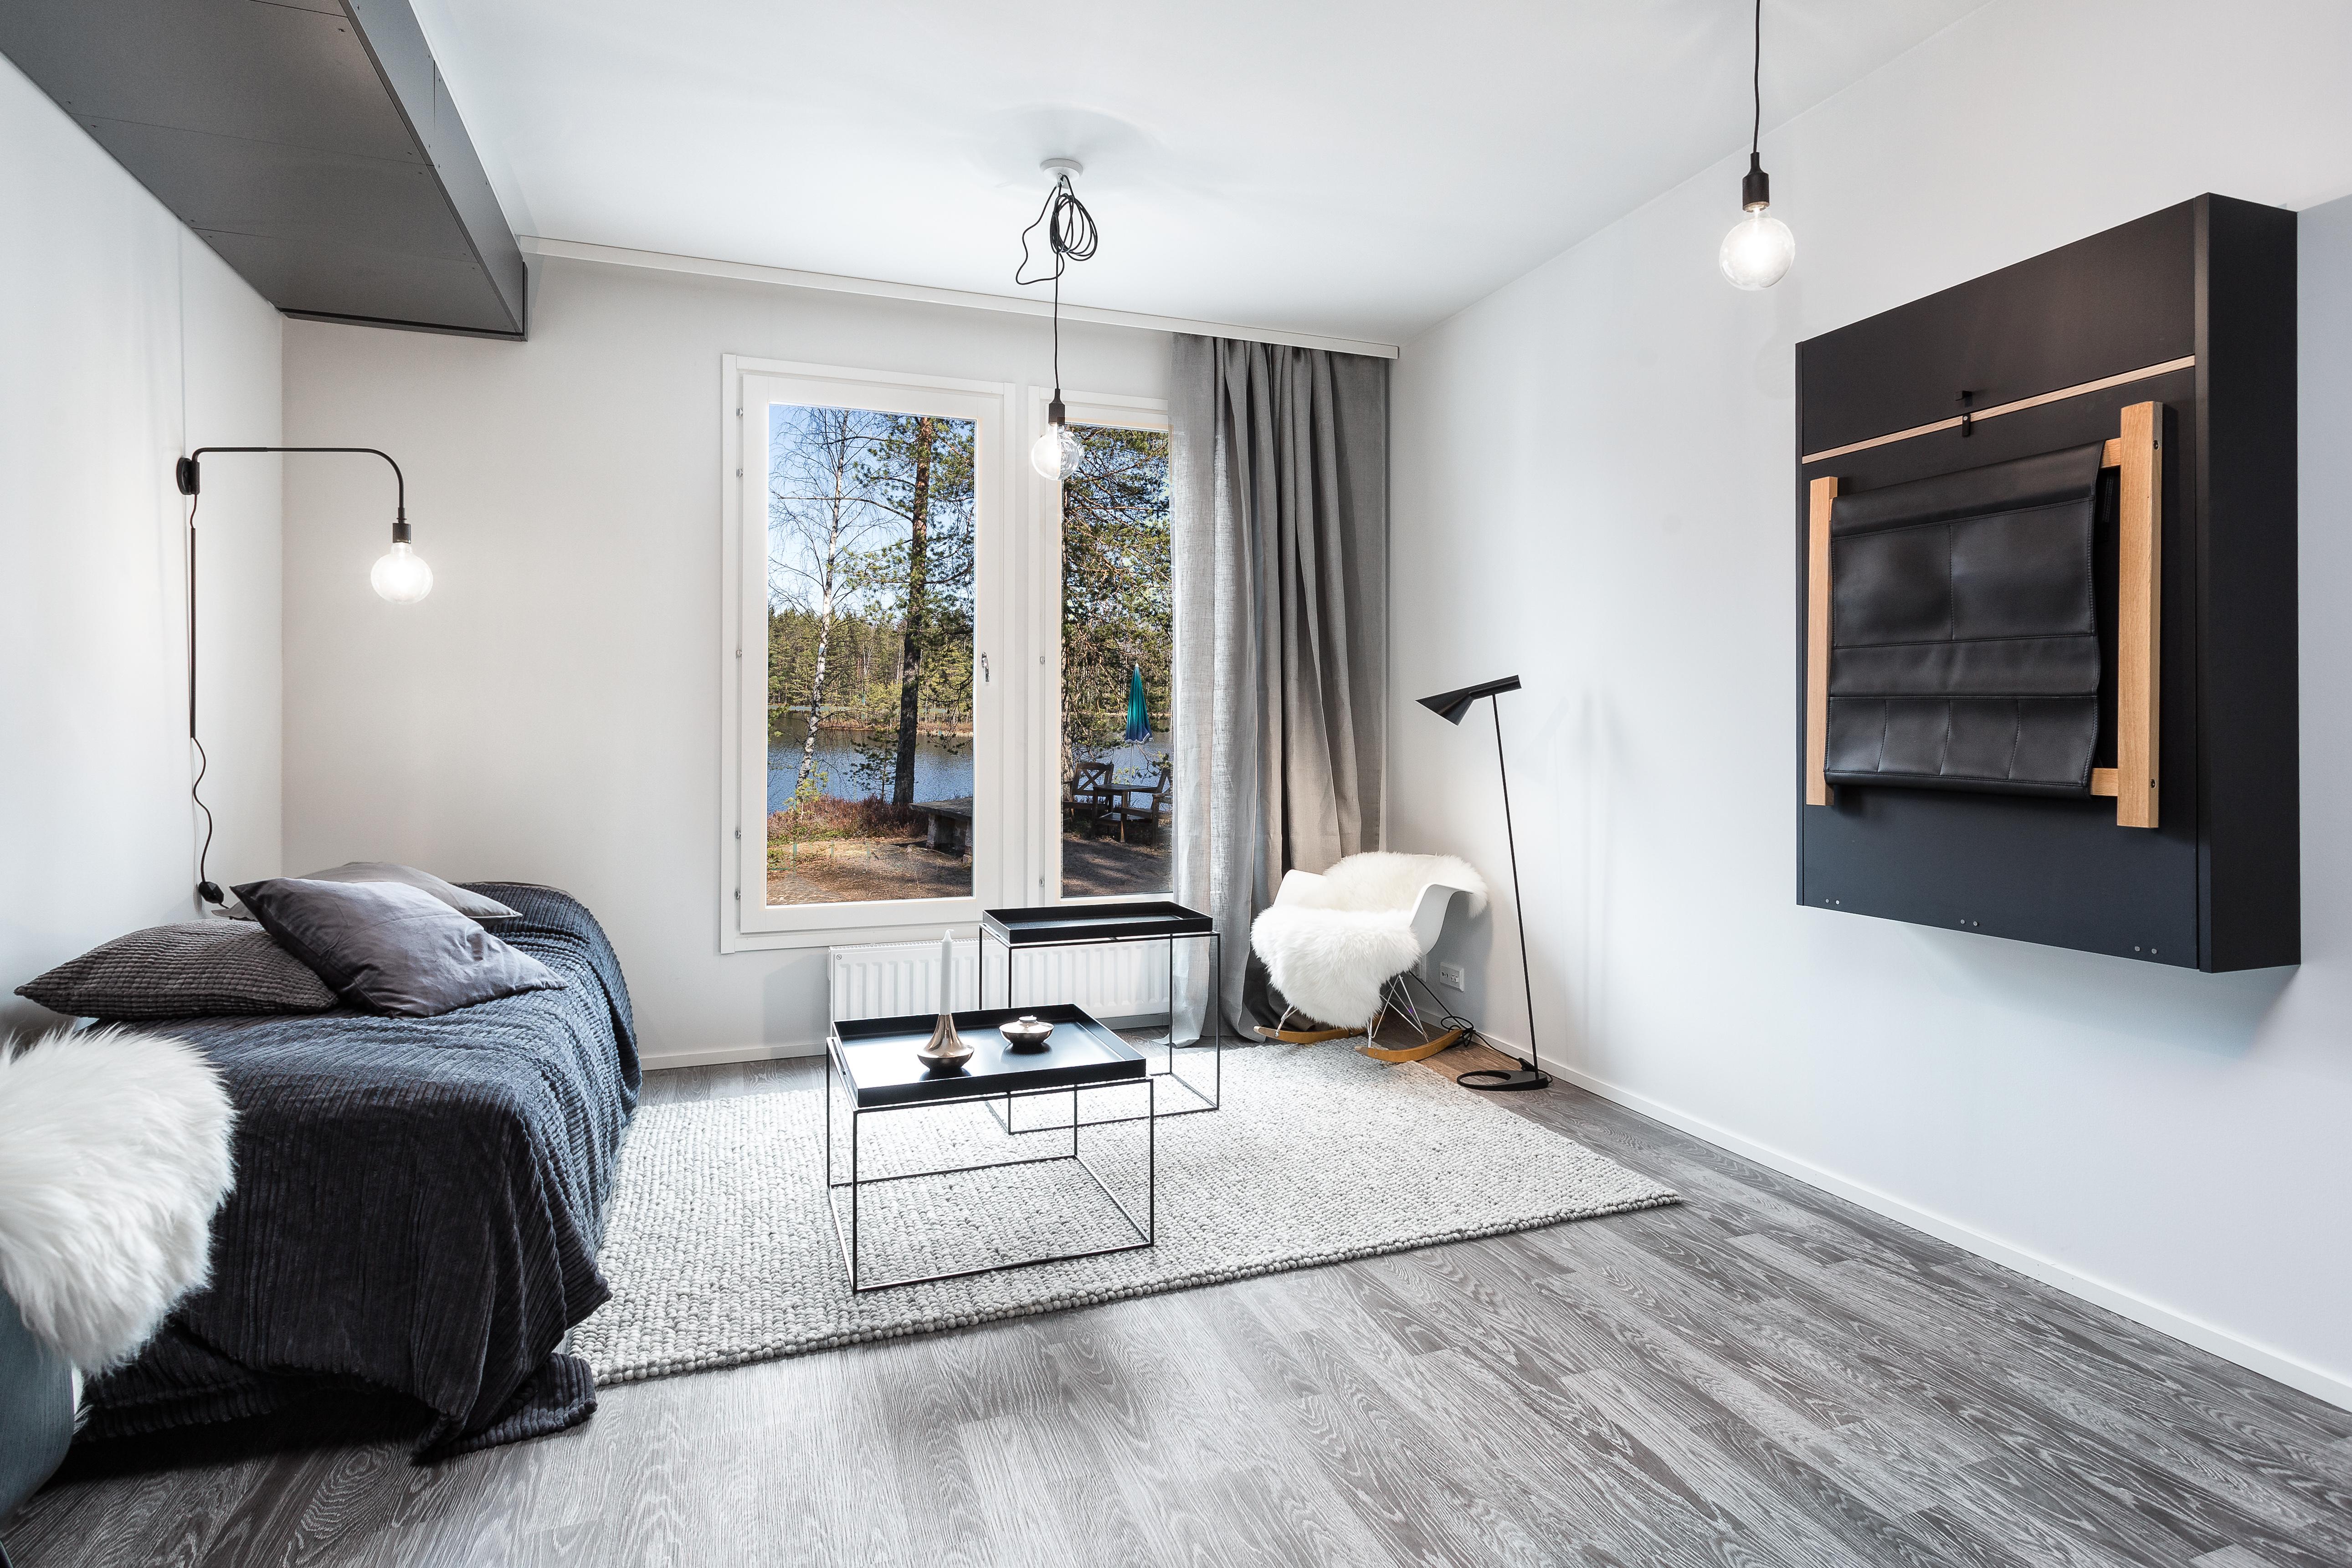 yit koti Lappeenranta